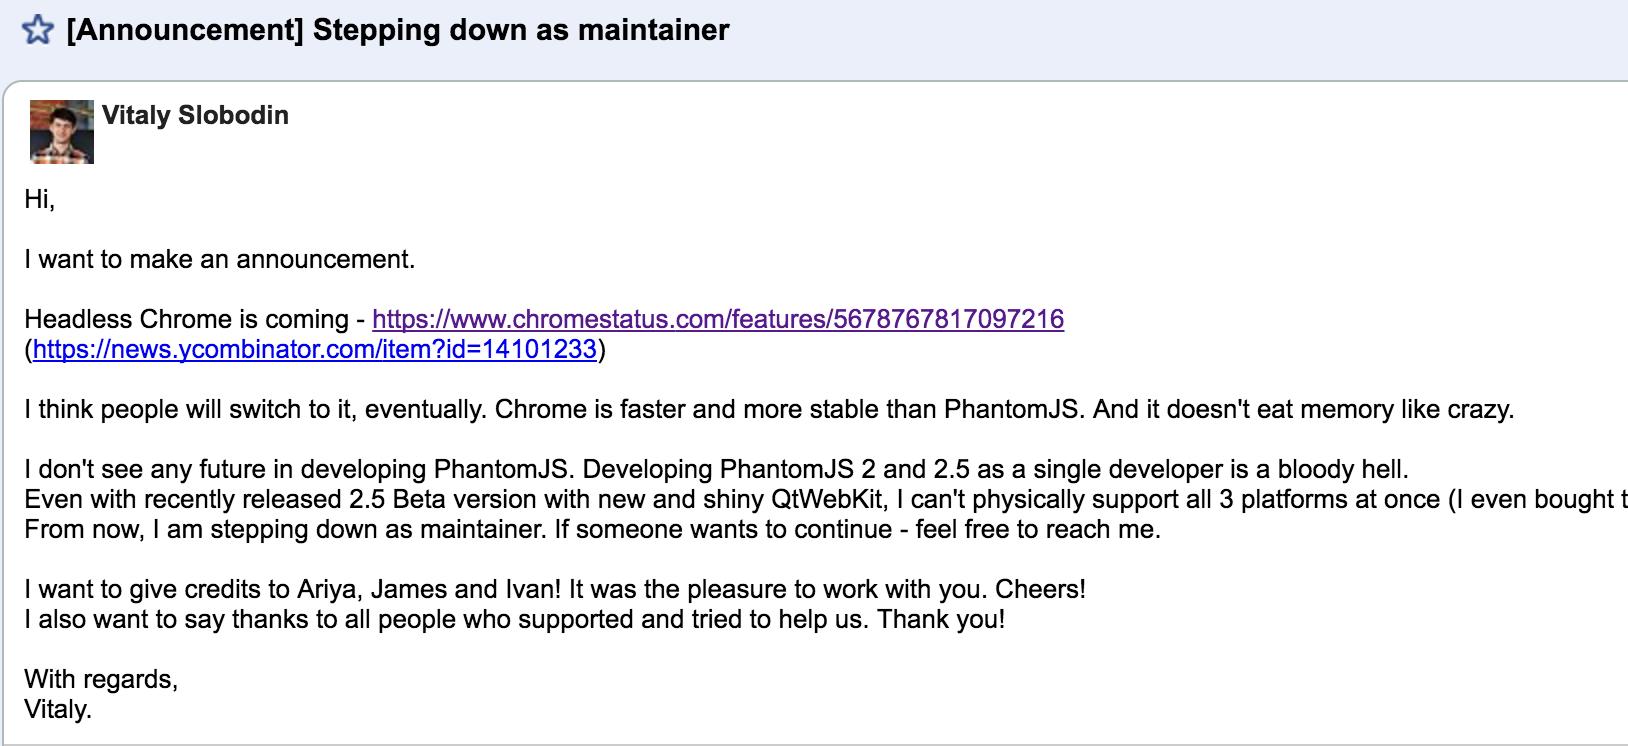 151929 QhvJ 2896879 PhantomJS 核心开发者宣布退出,项目或面临困境